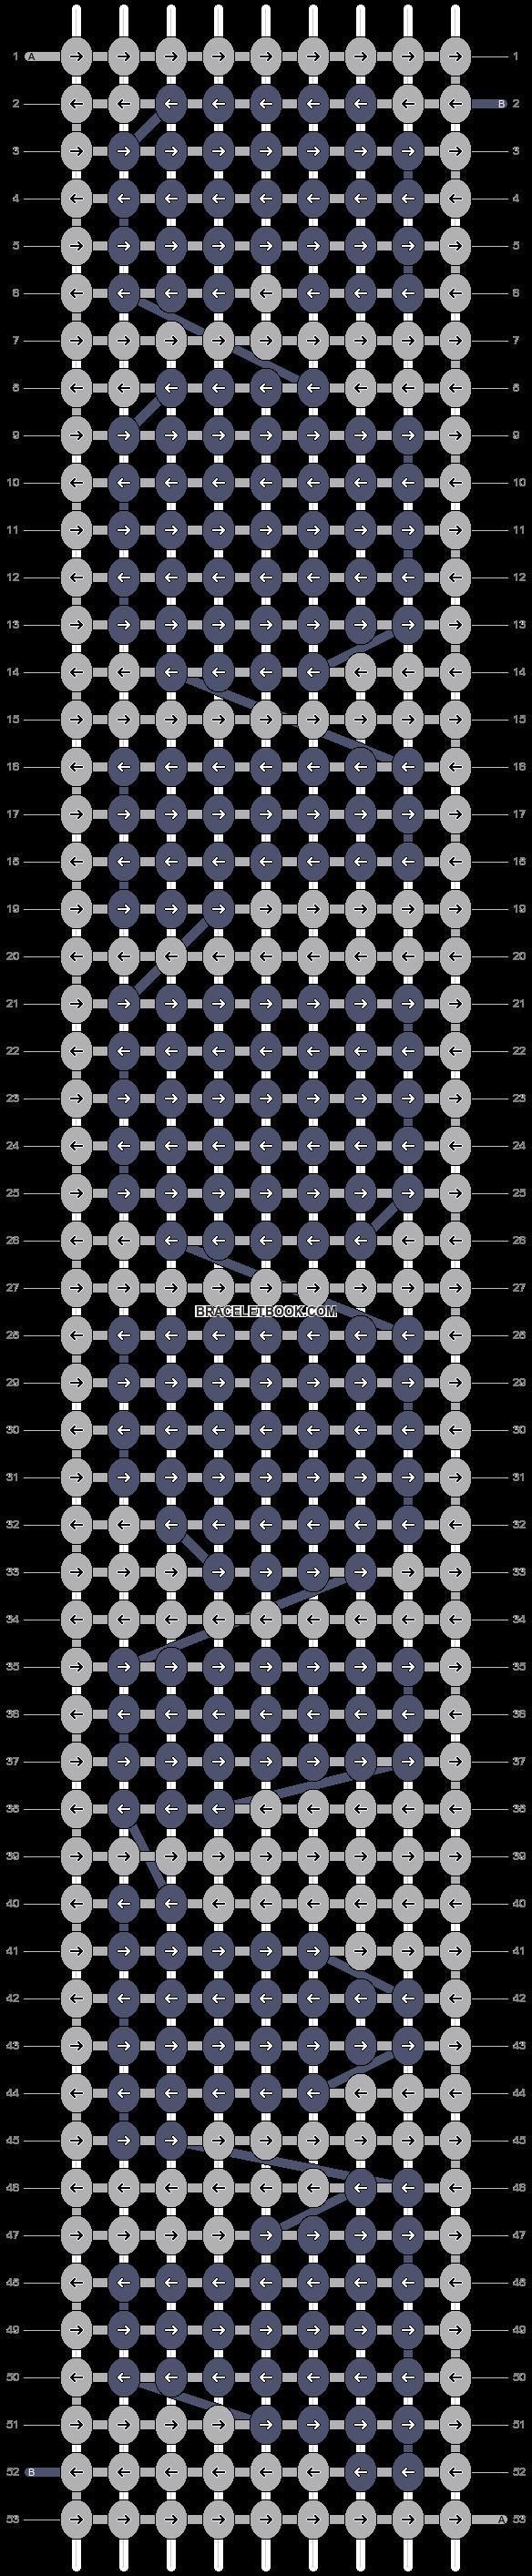 Alpha pattern #3270 pattern